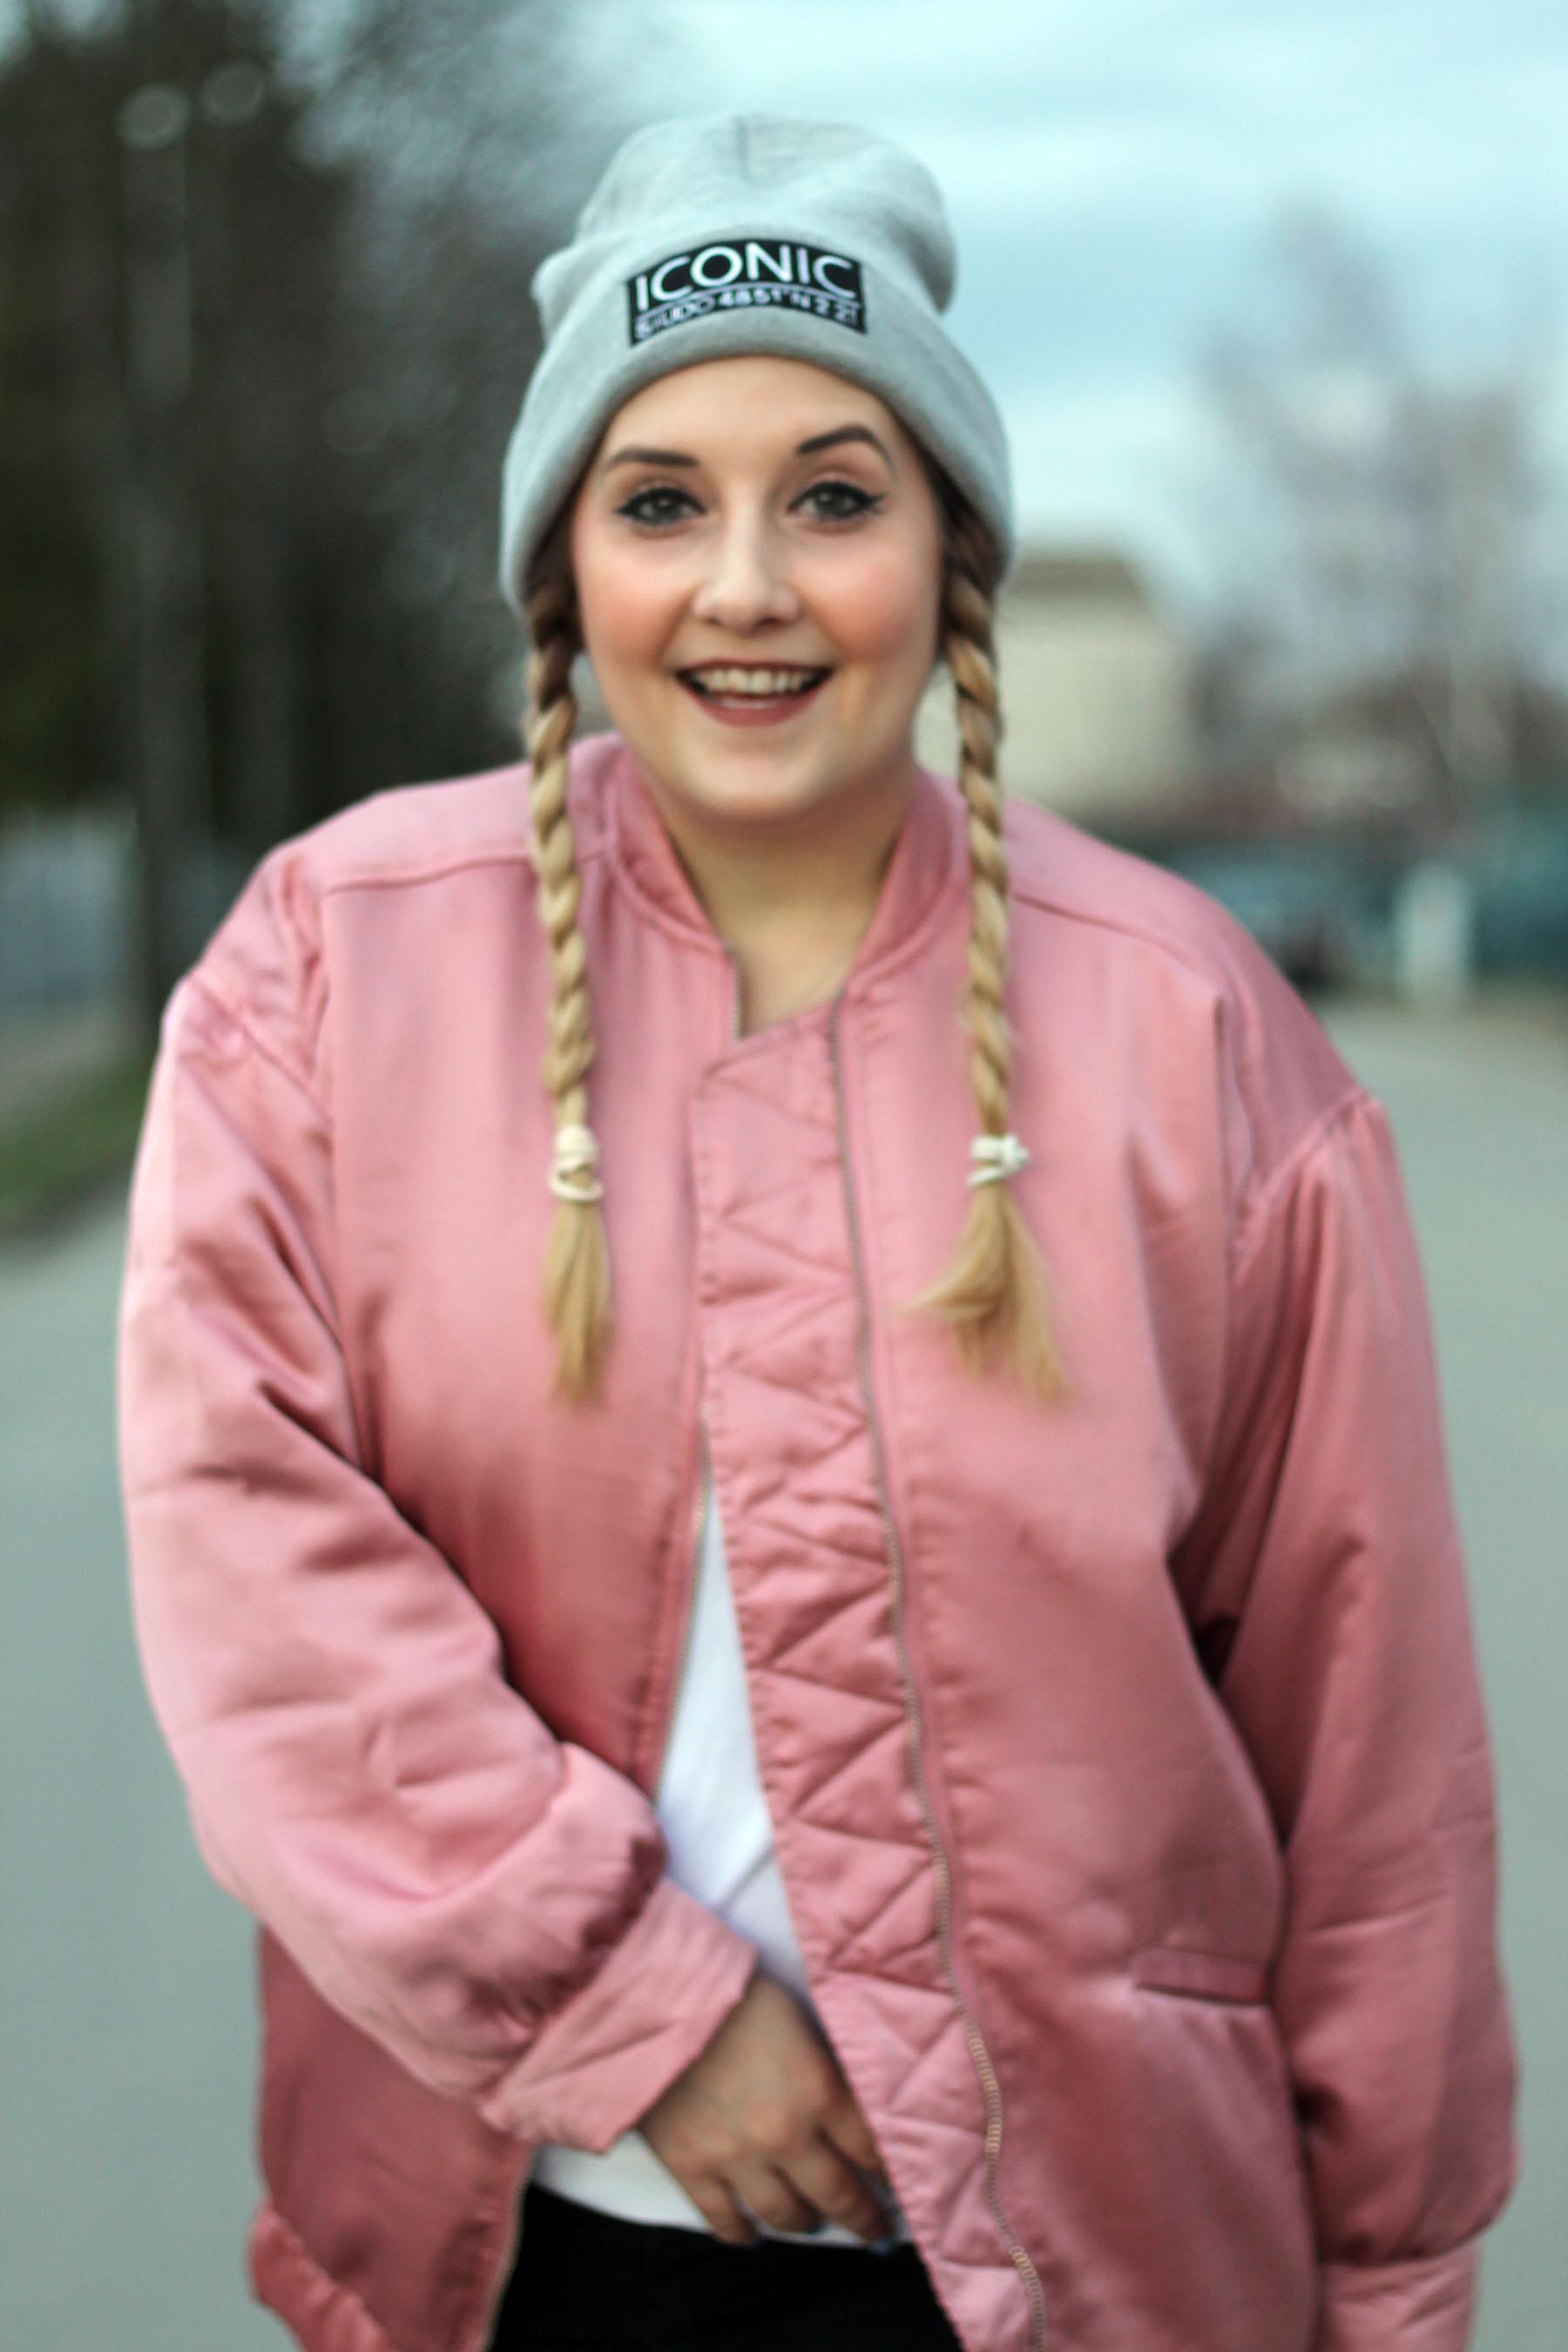 valentinstagslook-outfit-style-modeblog-fashionblog-mütze-beanie-rosa-bomberjacke